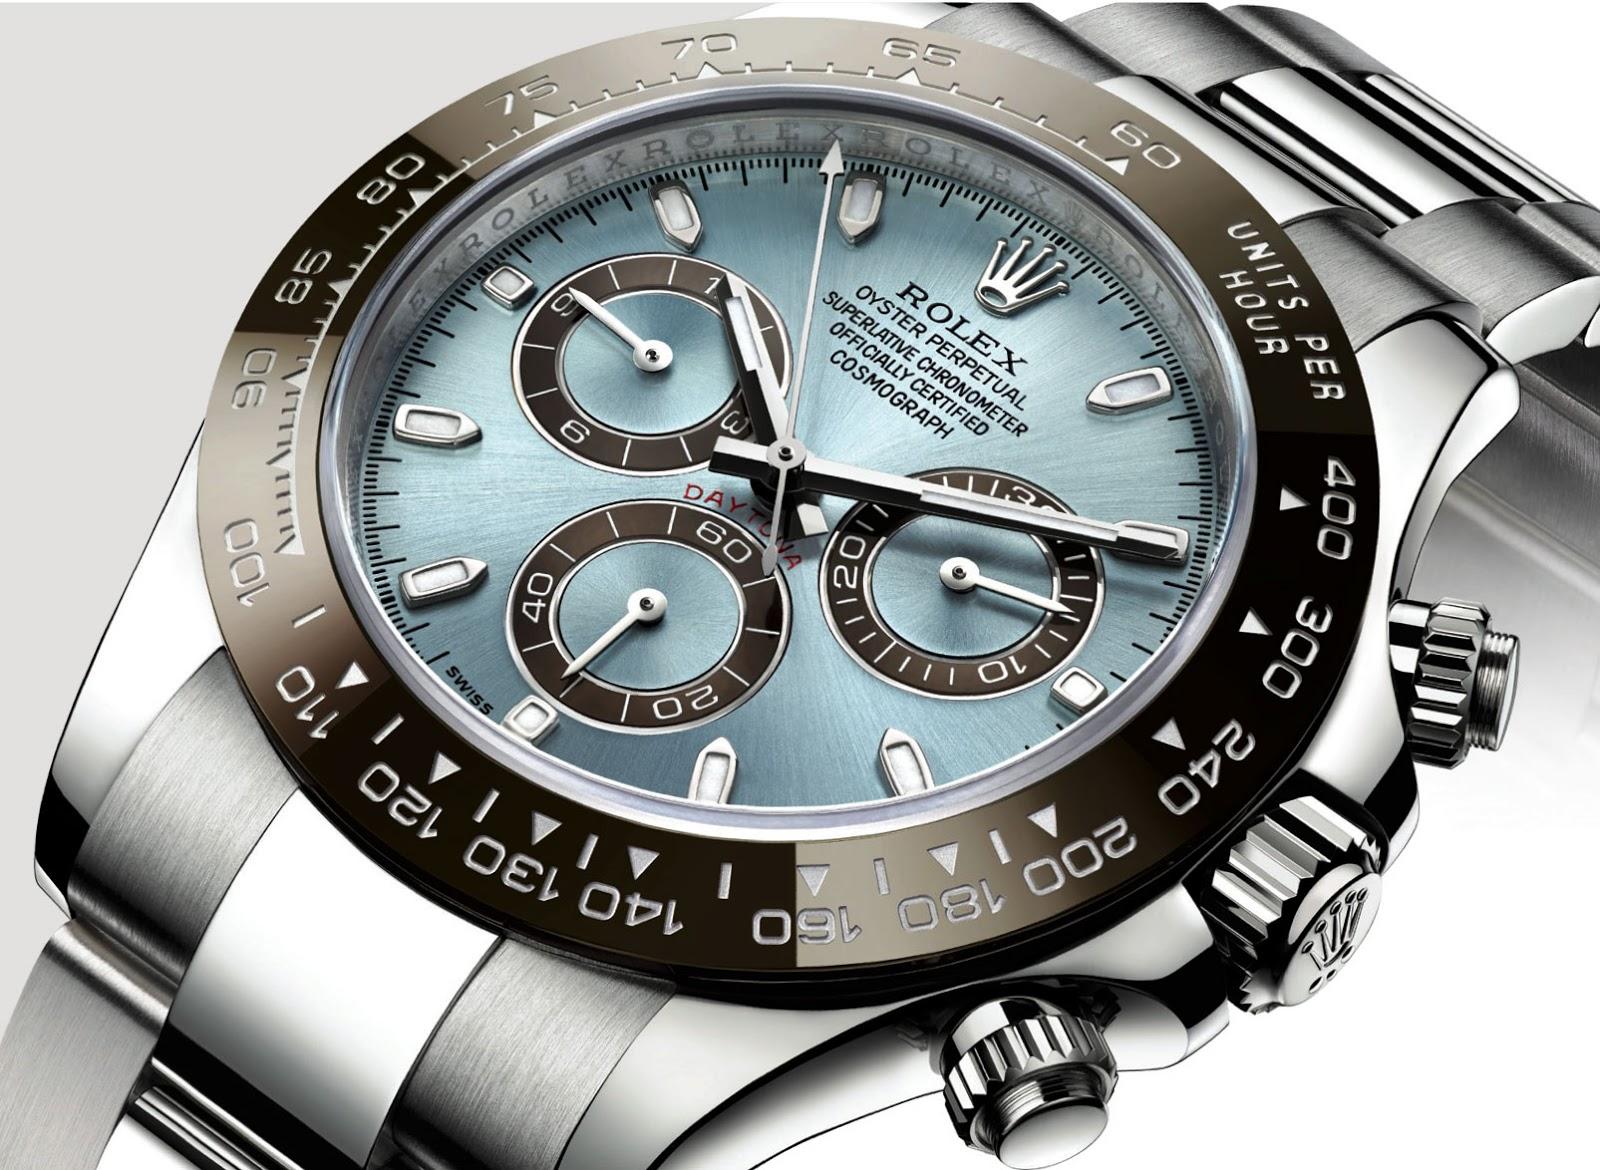 Image result for اسعار الساعات السويسرية